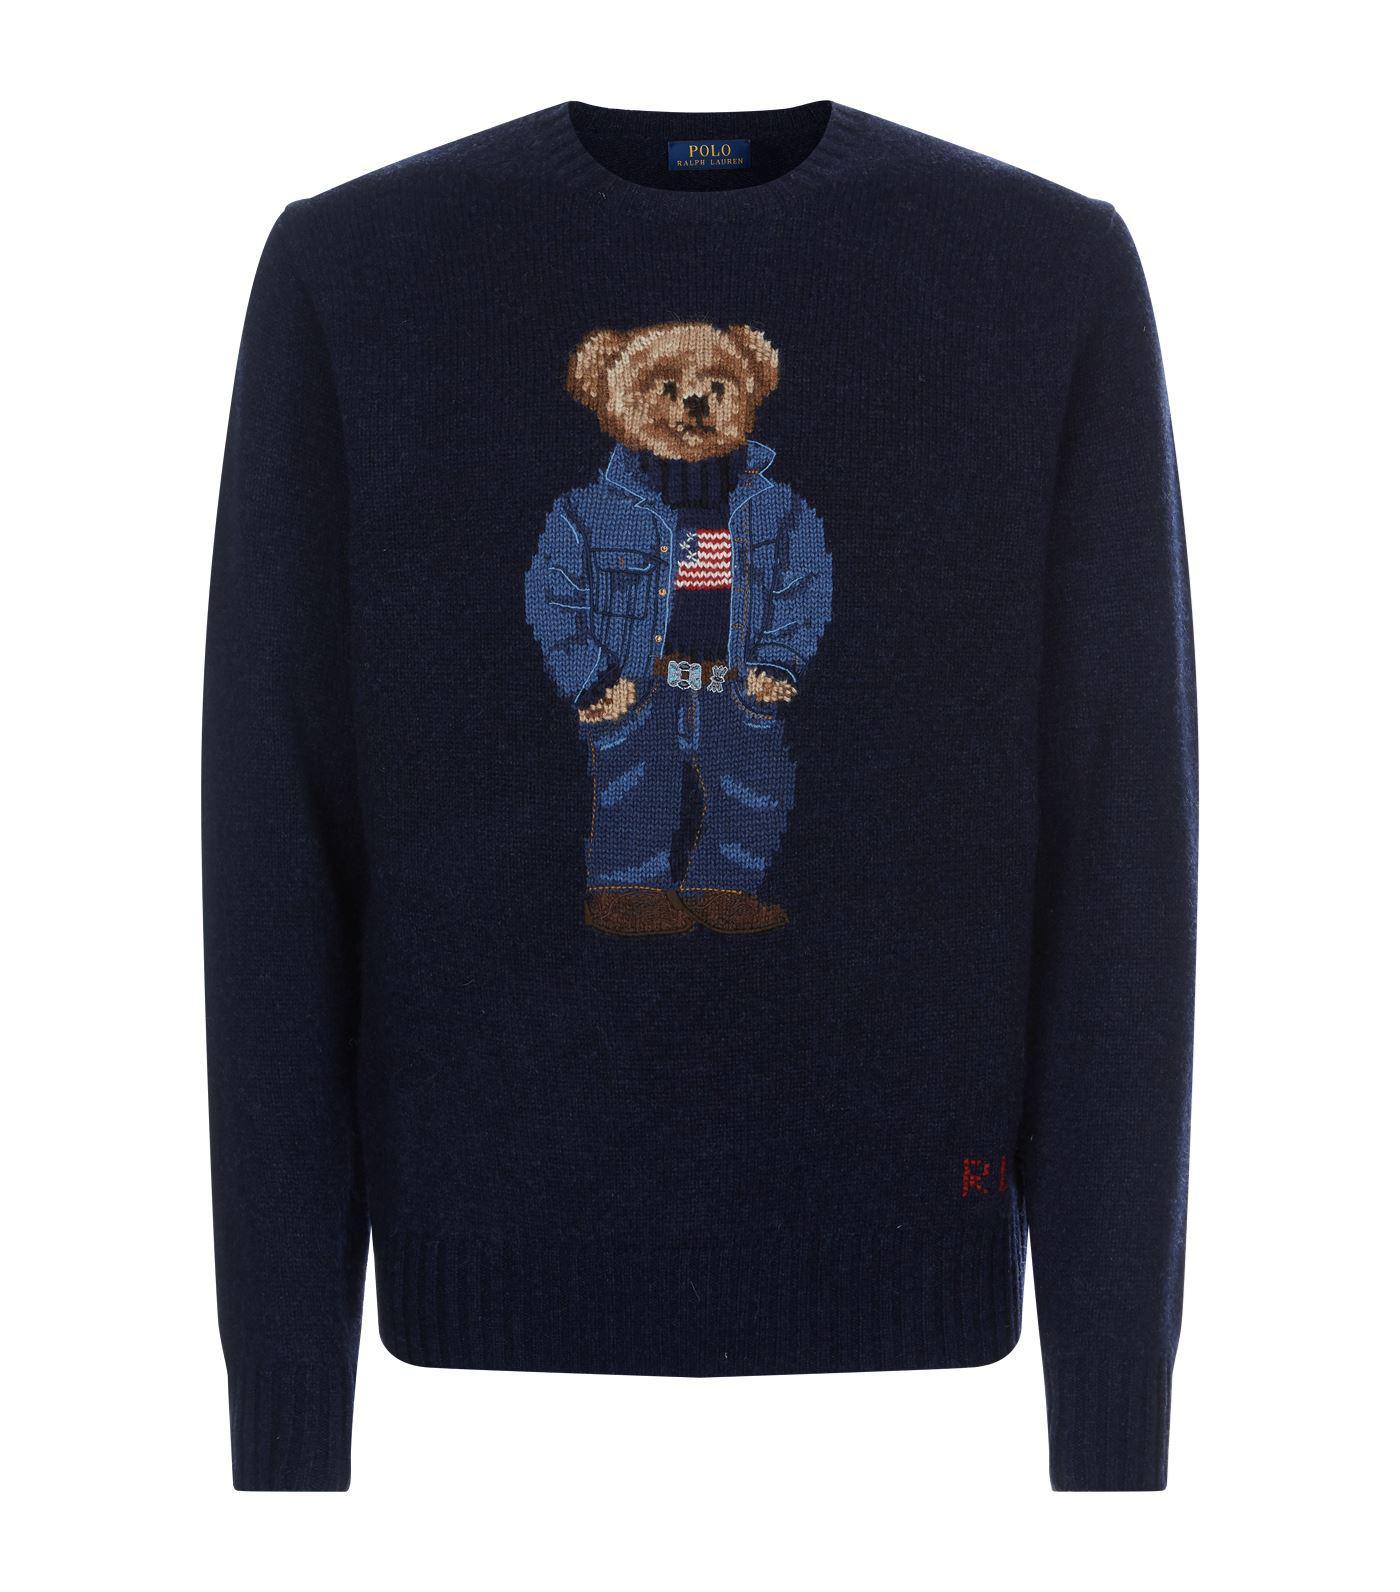 b7cc91d3f Lyst - Polo Ralph Lauren Polo Bear Sweater in Blue for Men